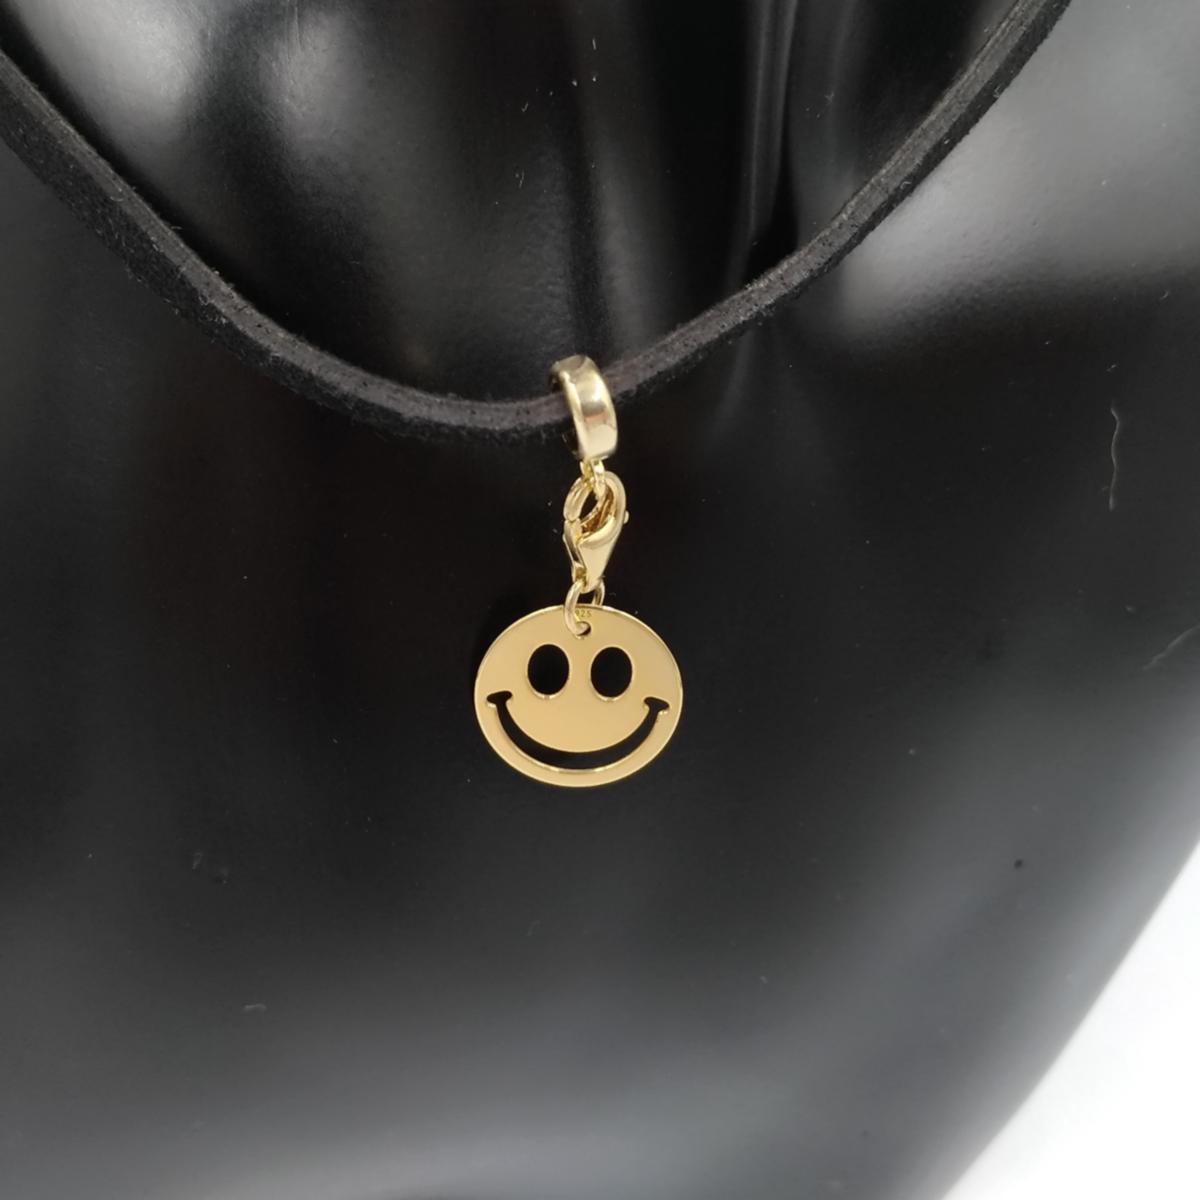 Pendentif charme Smiley or jaune